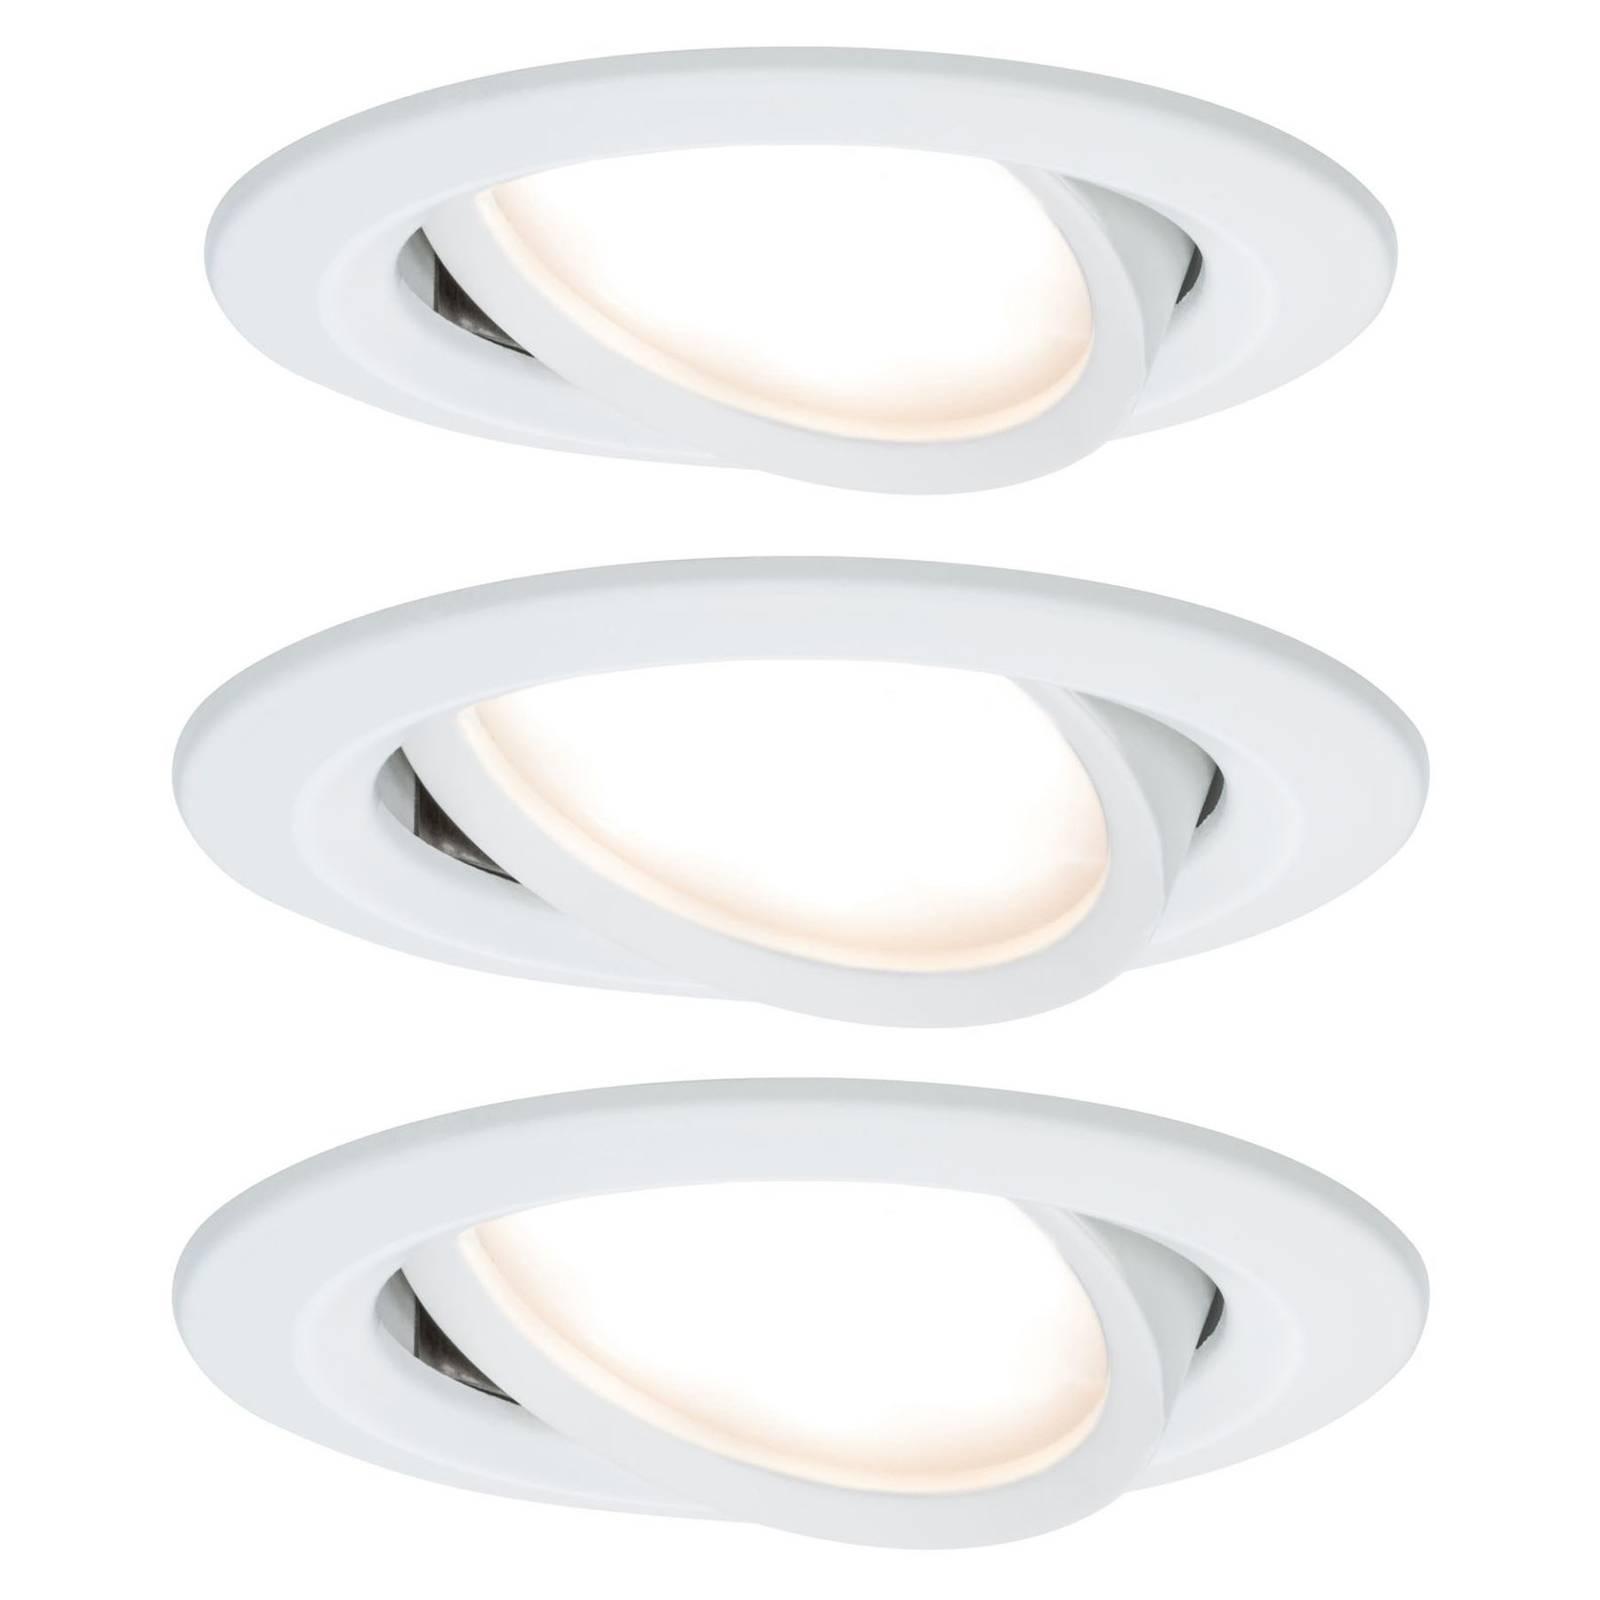 Paulmann Nova LED inbouwspot, gezwenkt, alu